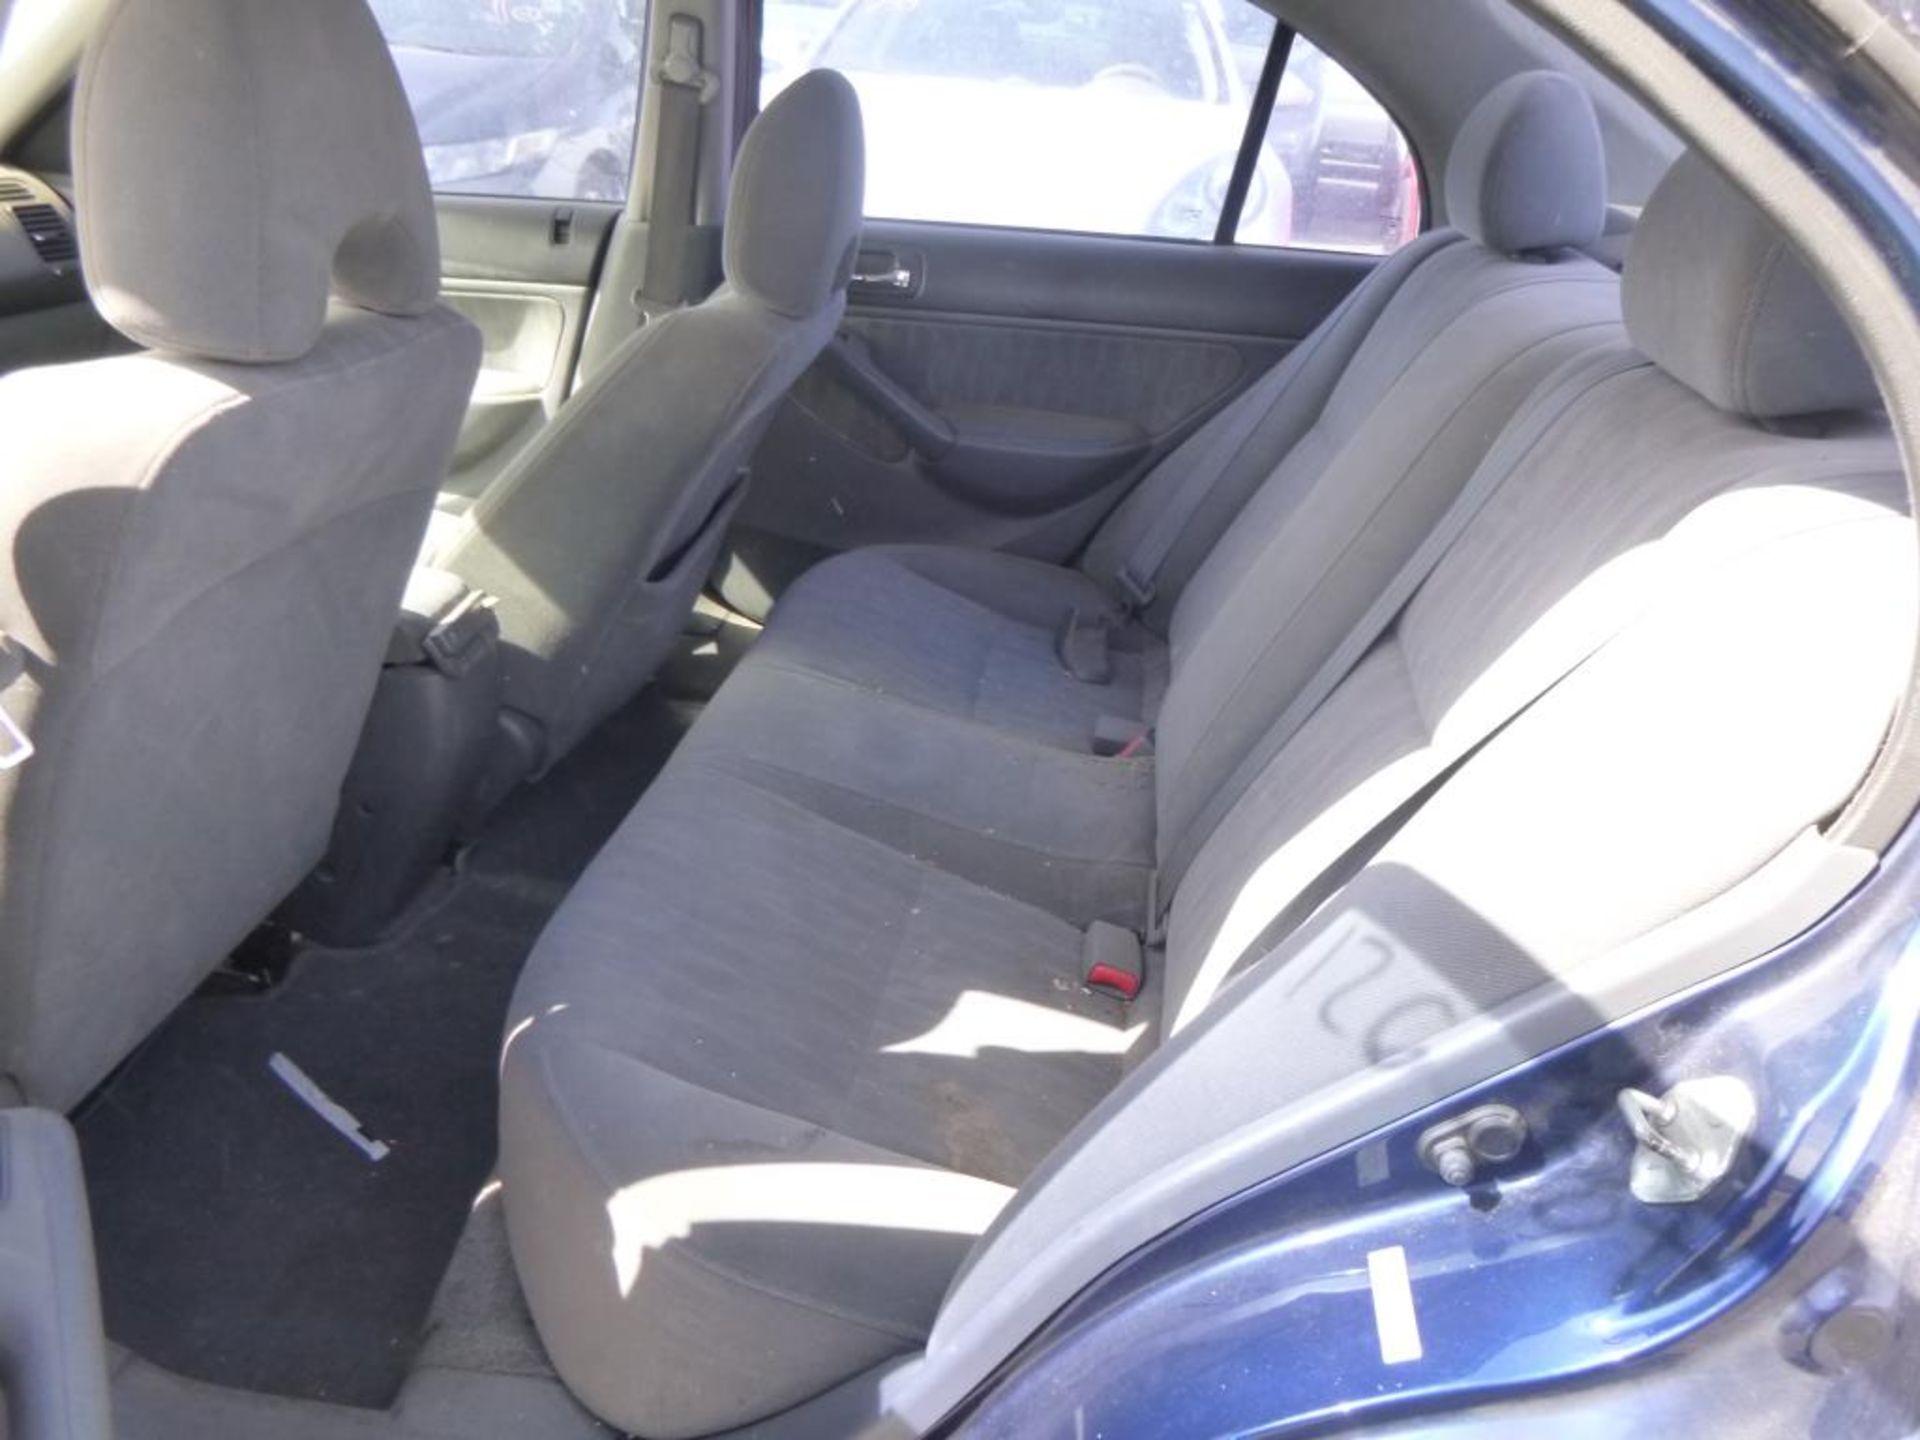 2004 Honda Civic - Image 7 of 14